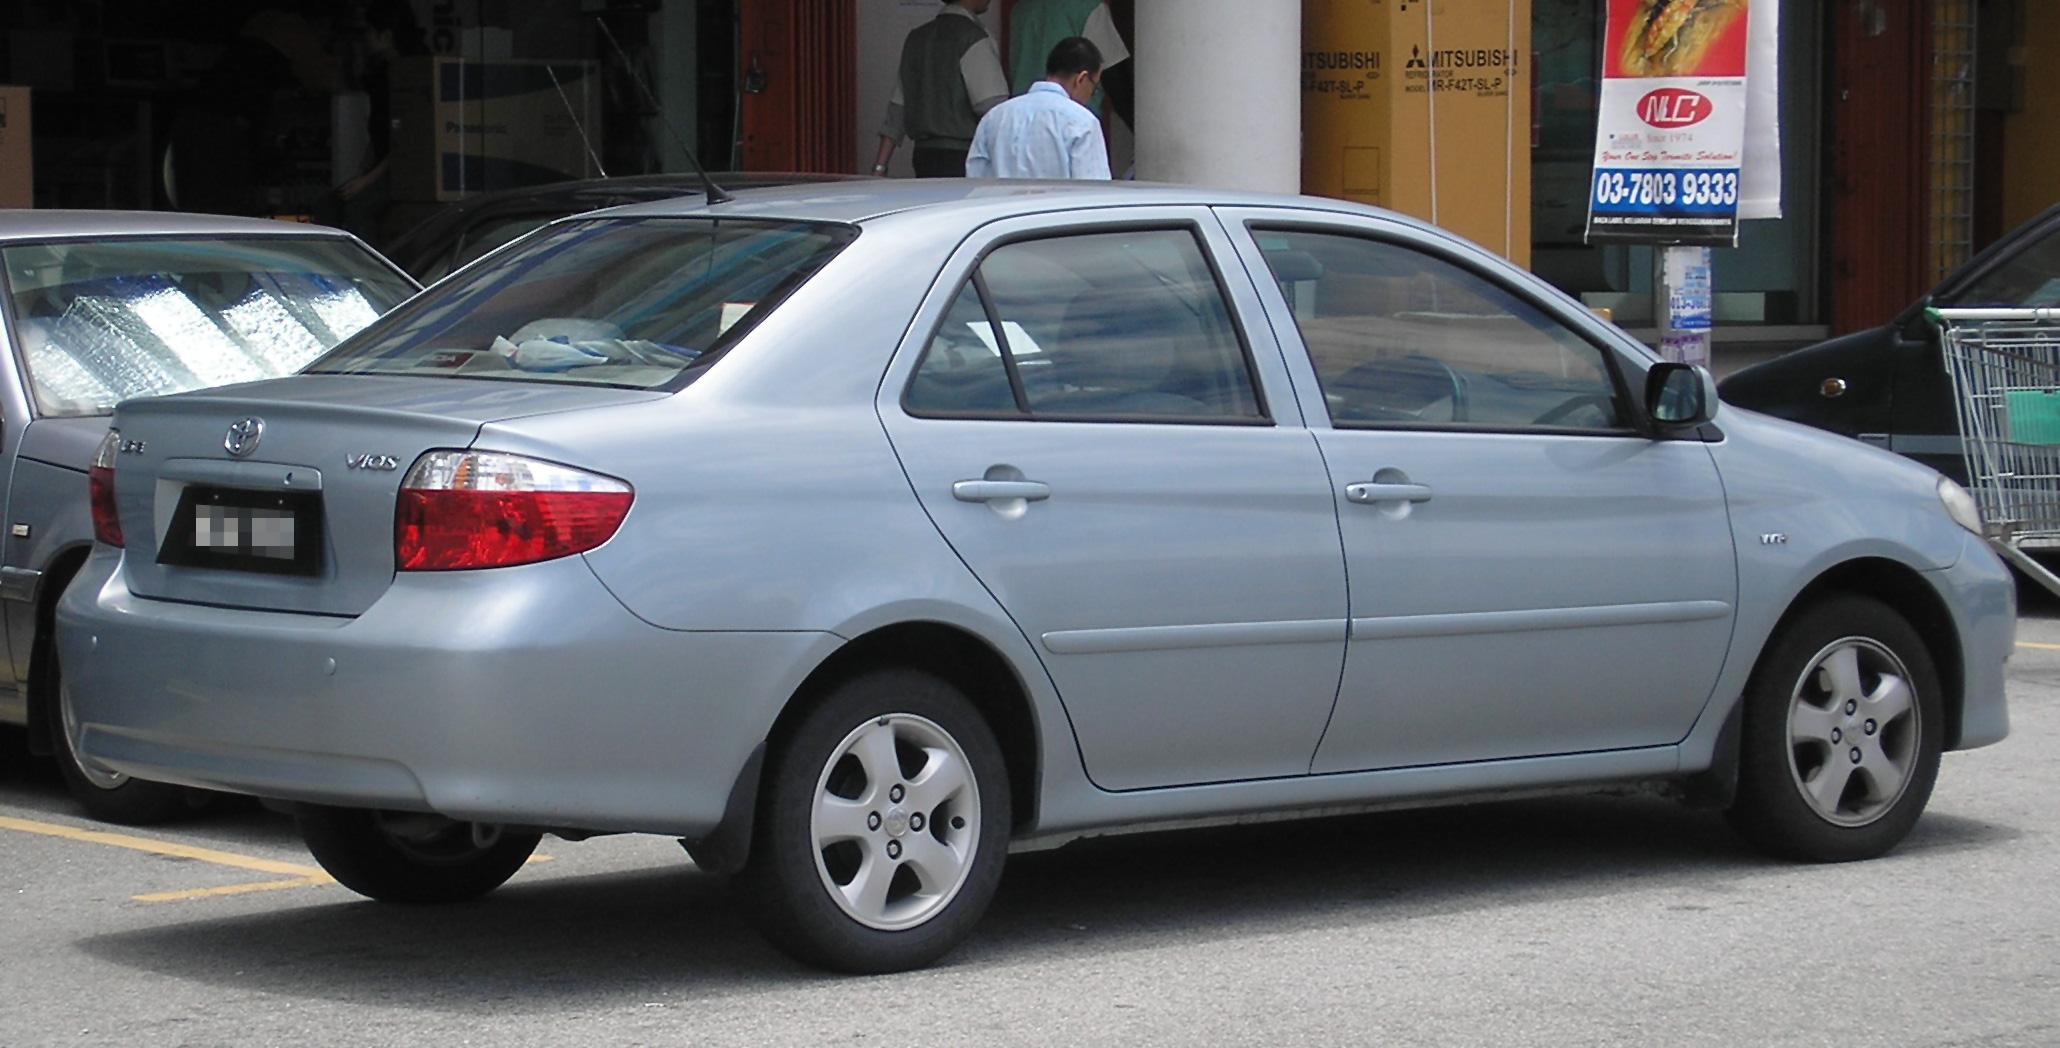 File:Toyota Vios (first generation) (rear), Serdang.jpg